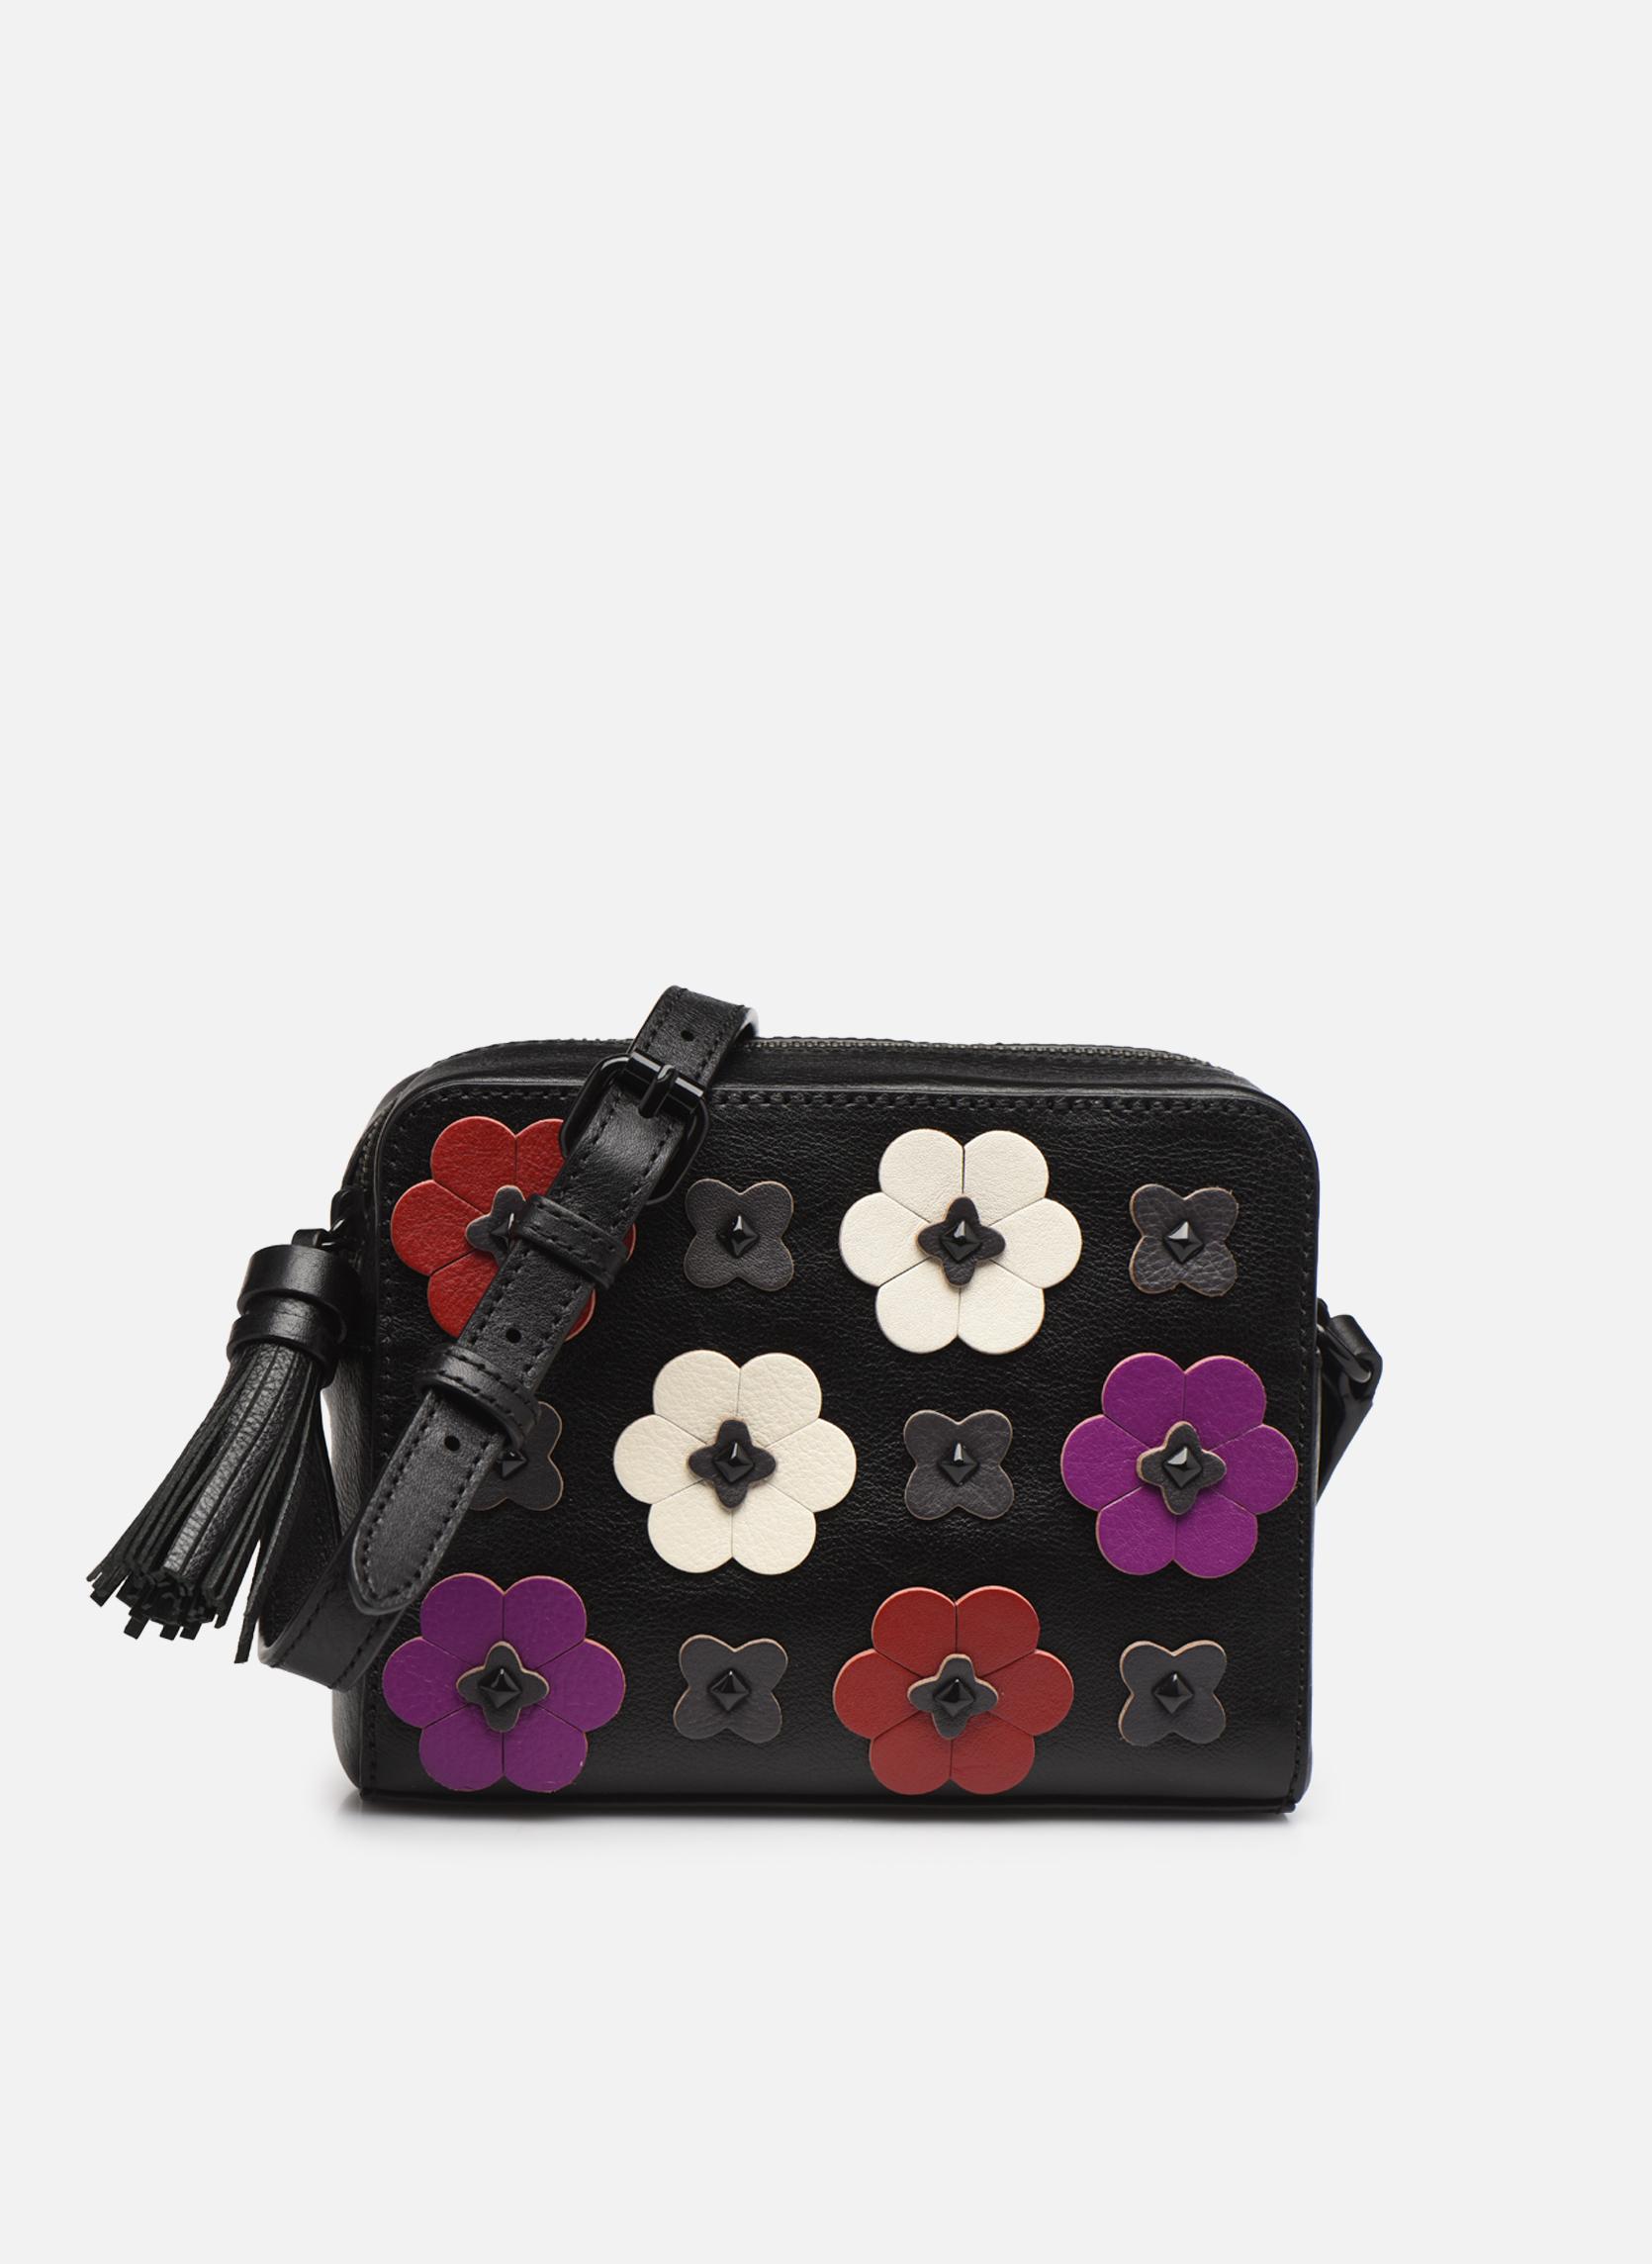 Floral Applique Camera bag